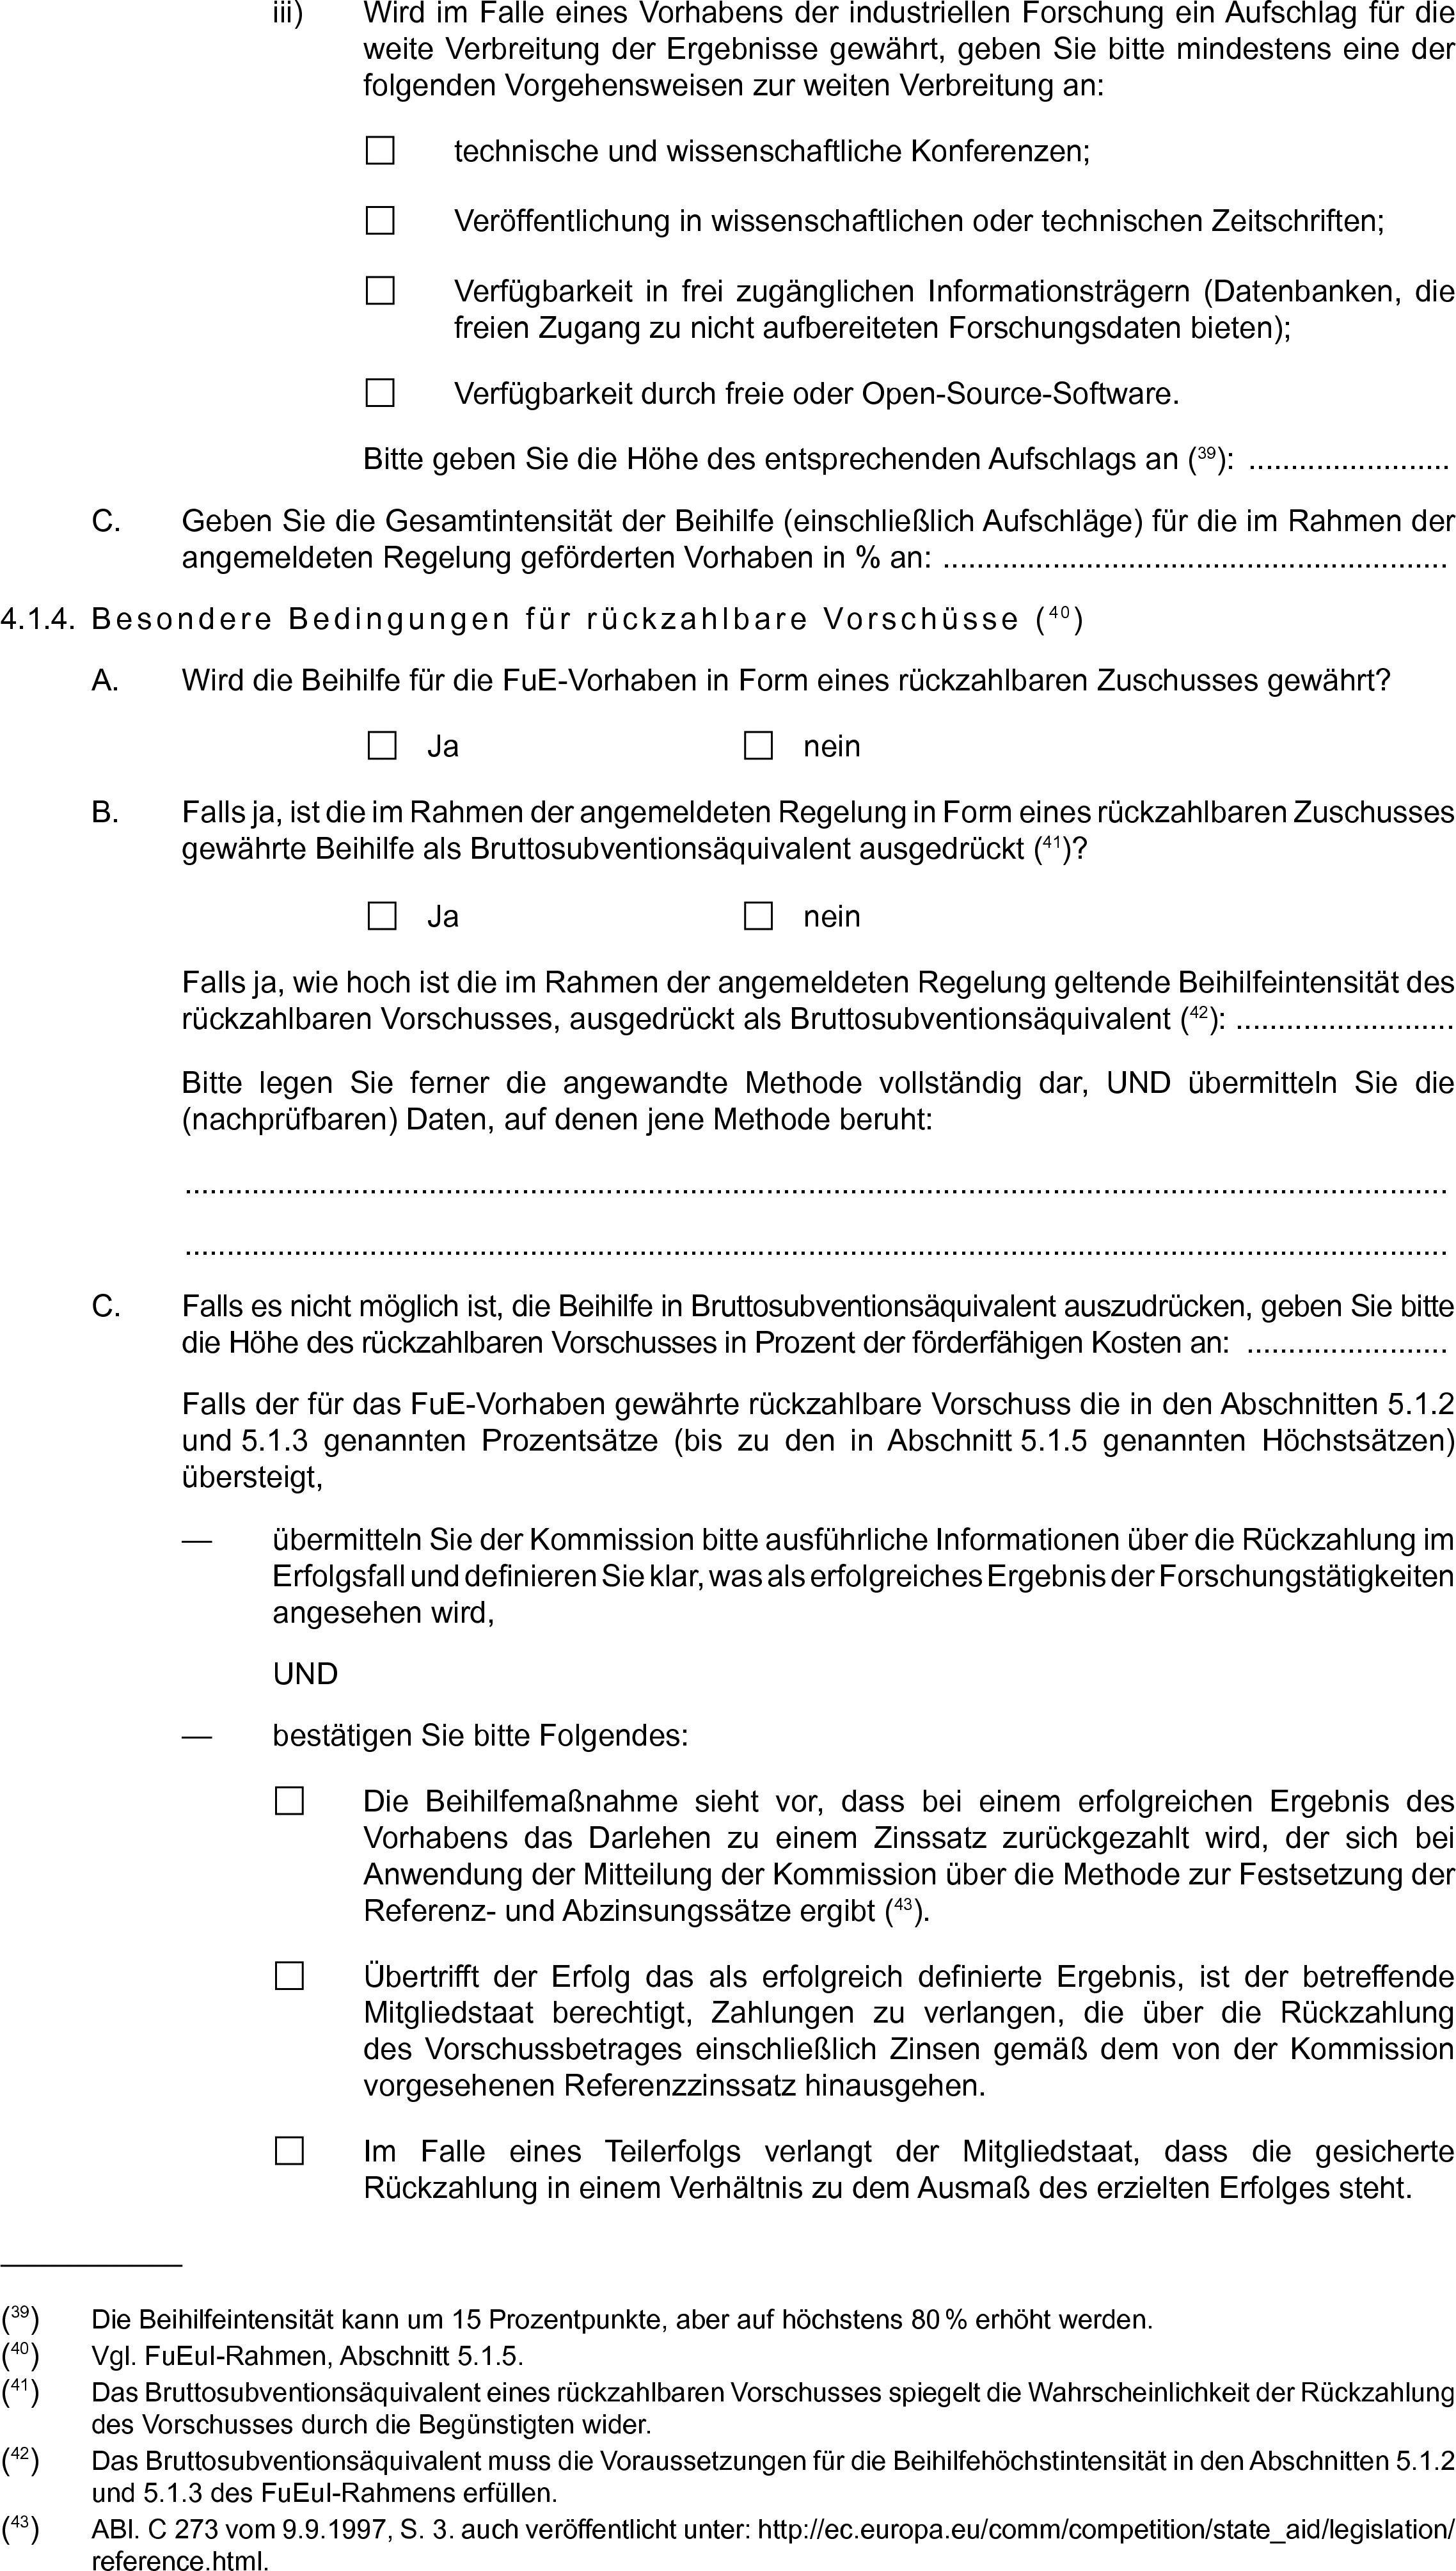 EUR-Lex - 02004R0794-20090416 - EN - EUR-Lex